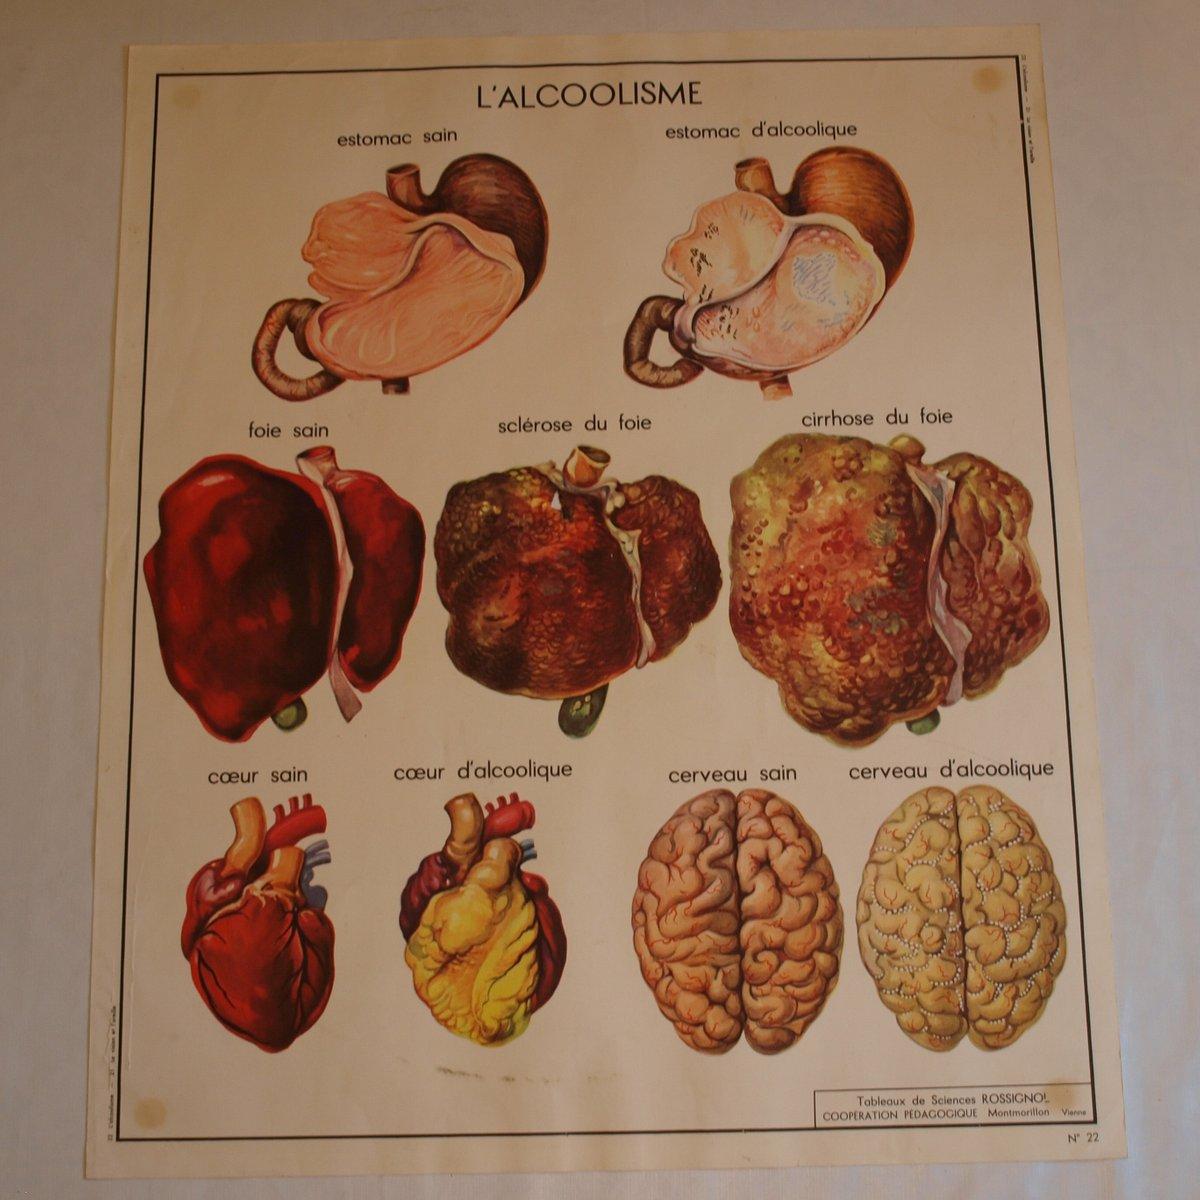 Anatomy Poster On Sale | 178.128.108.15